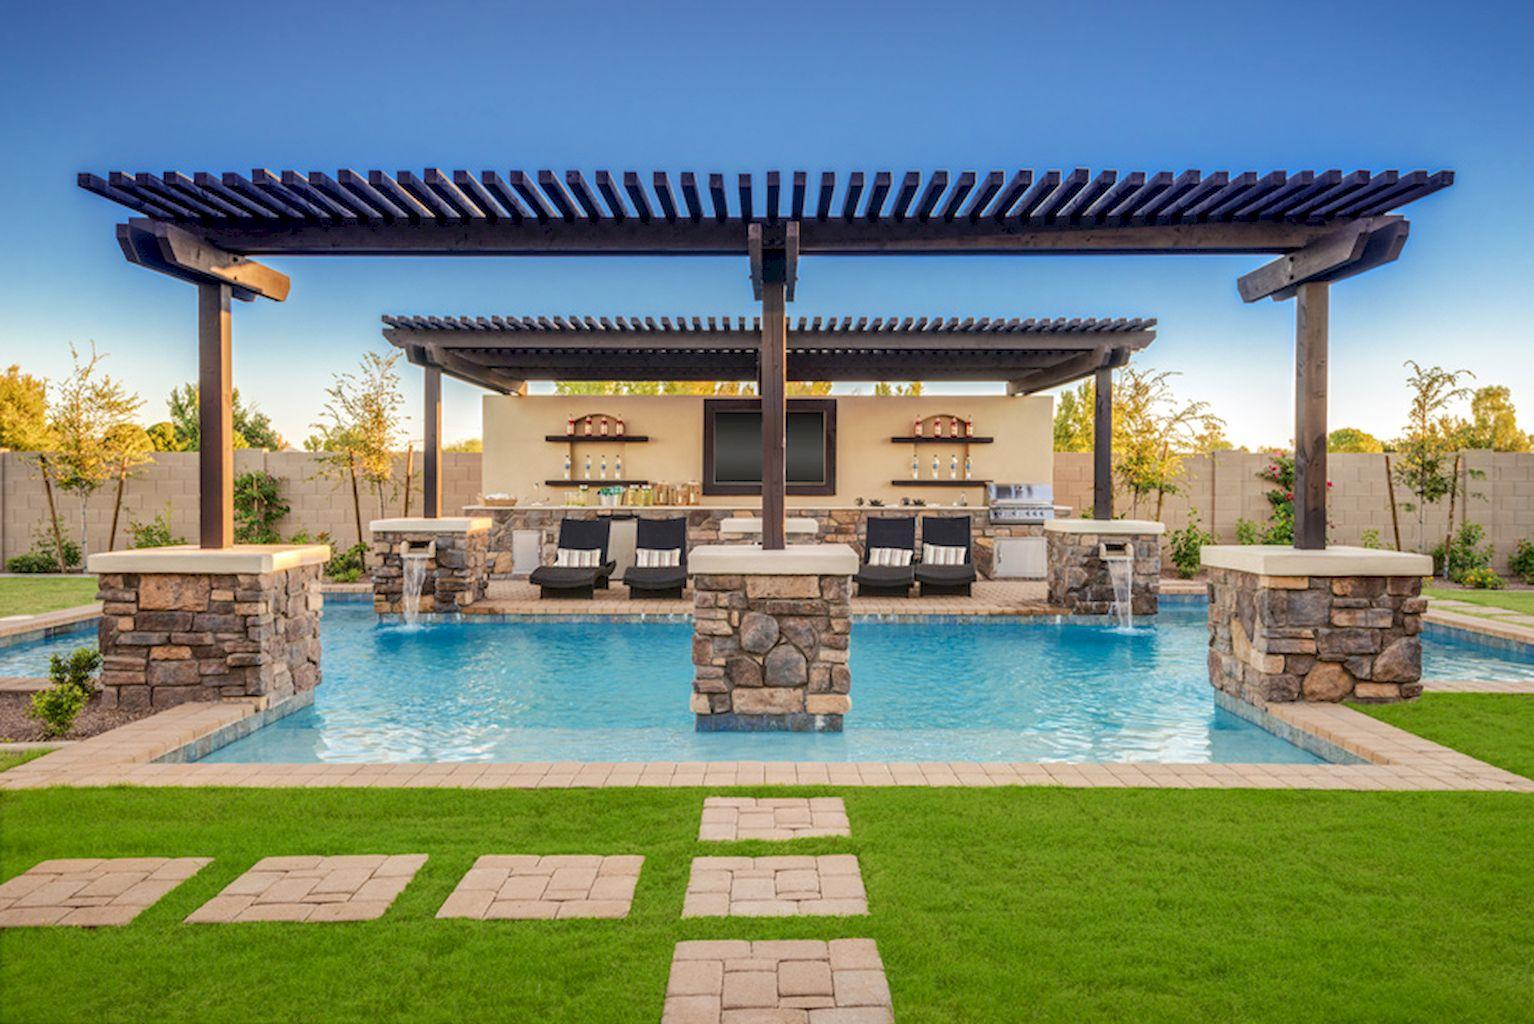 50 best arizona backyard ideas on a